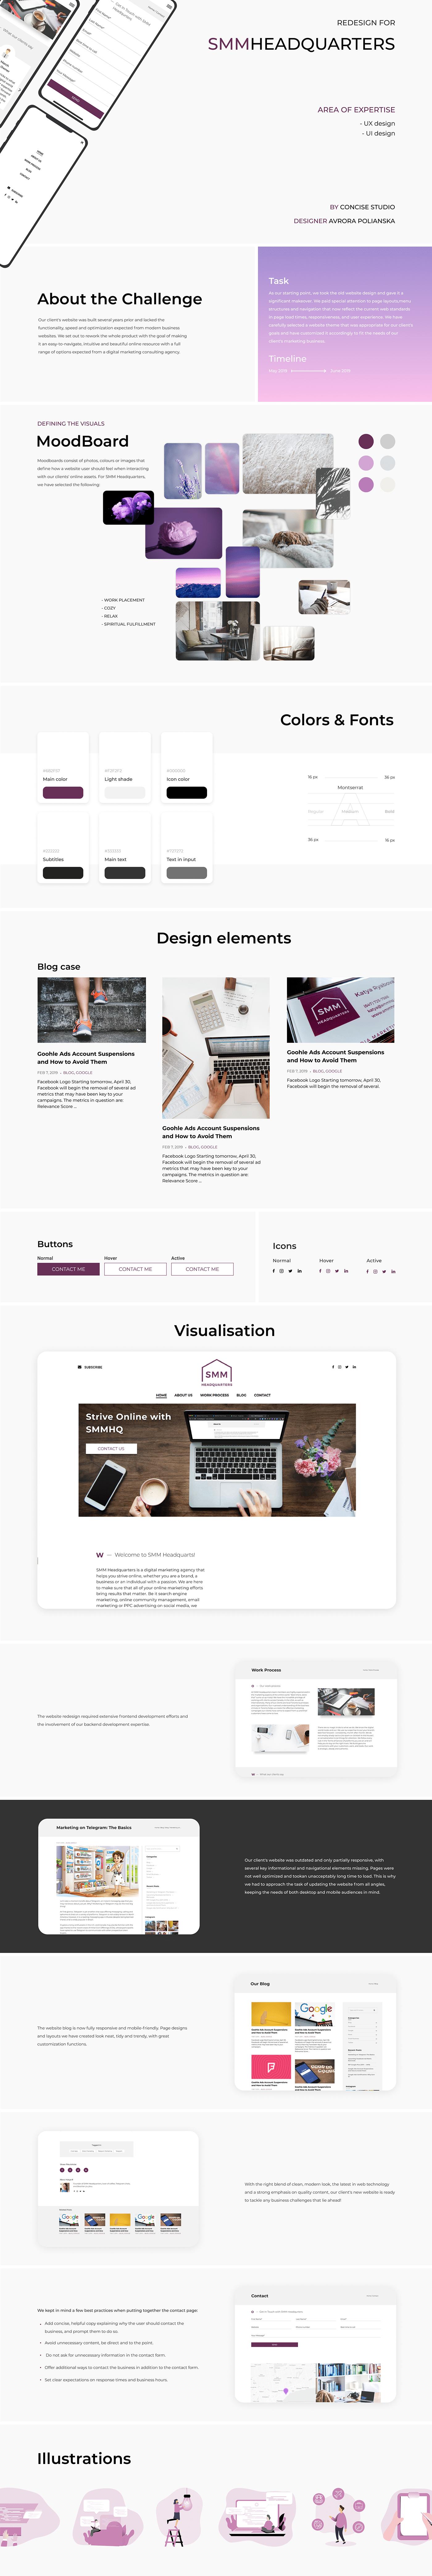 UX design ui design Mobile first design web site